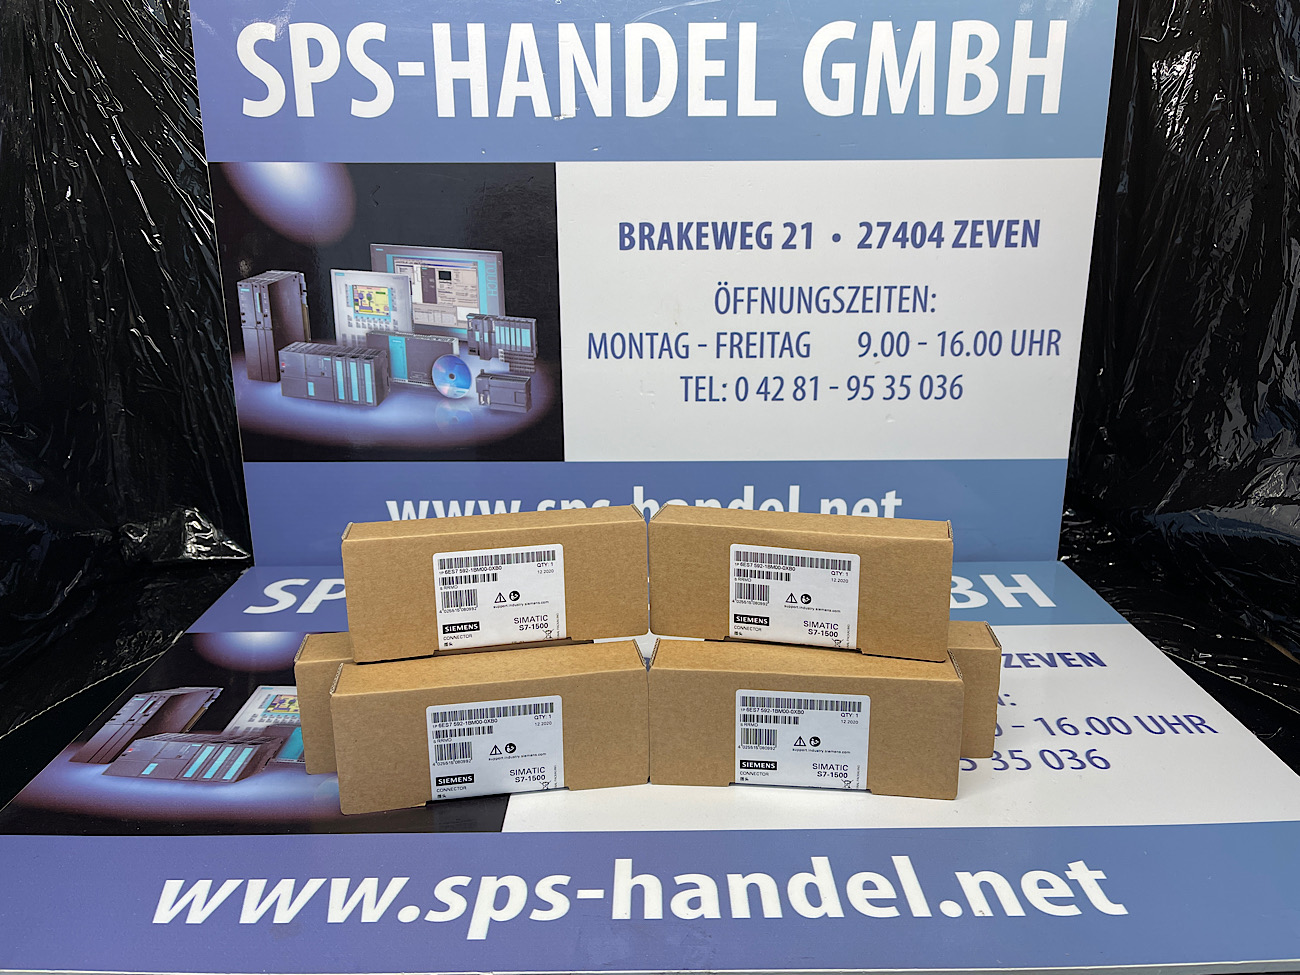 6ES7592-1BM00-0XB0 | S7-1500 40 Polig | Neu Siegel 26%